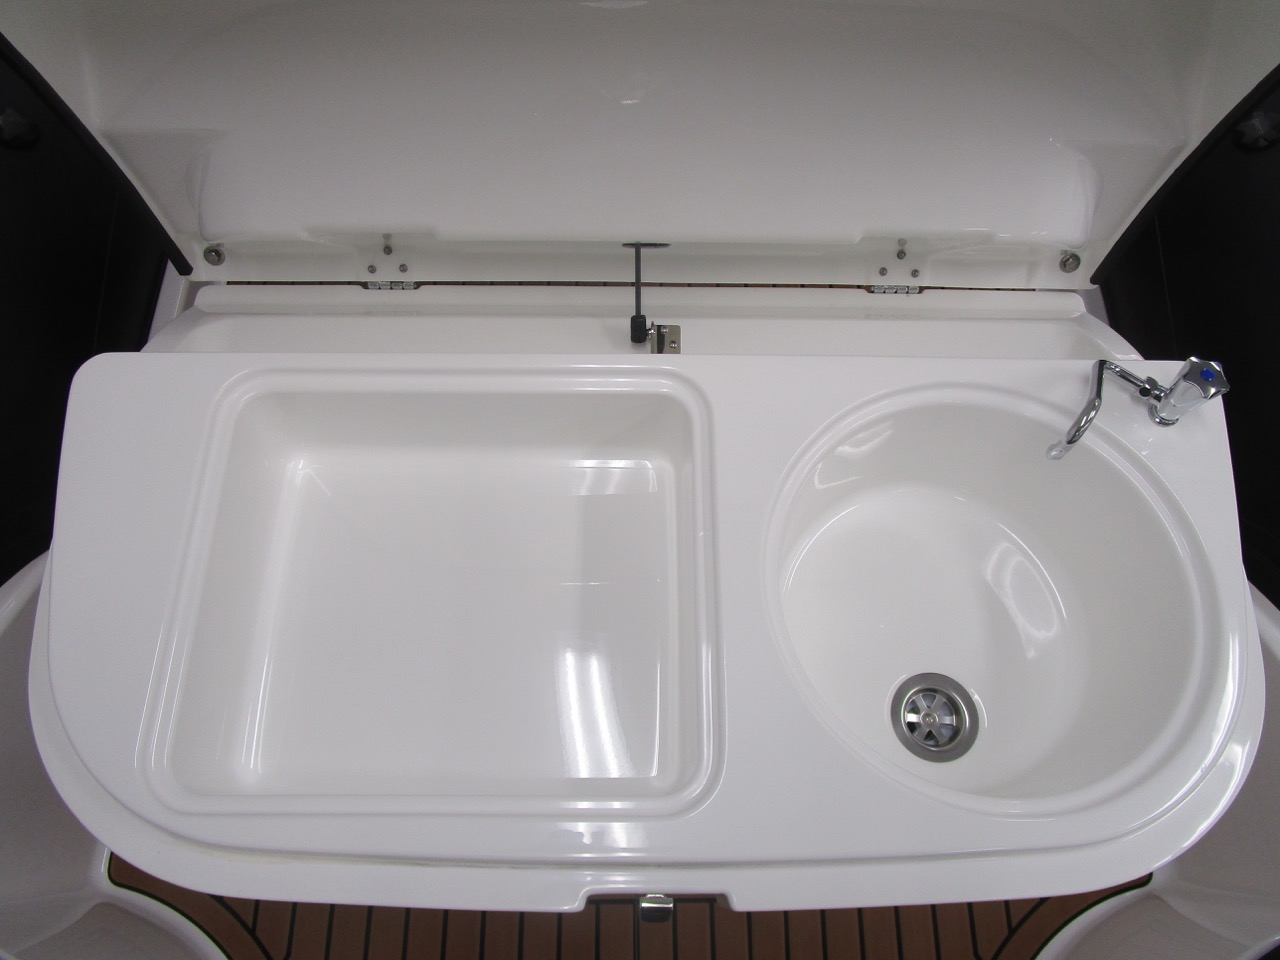 GRAND G850 RIB seat sink and storage